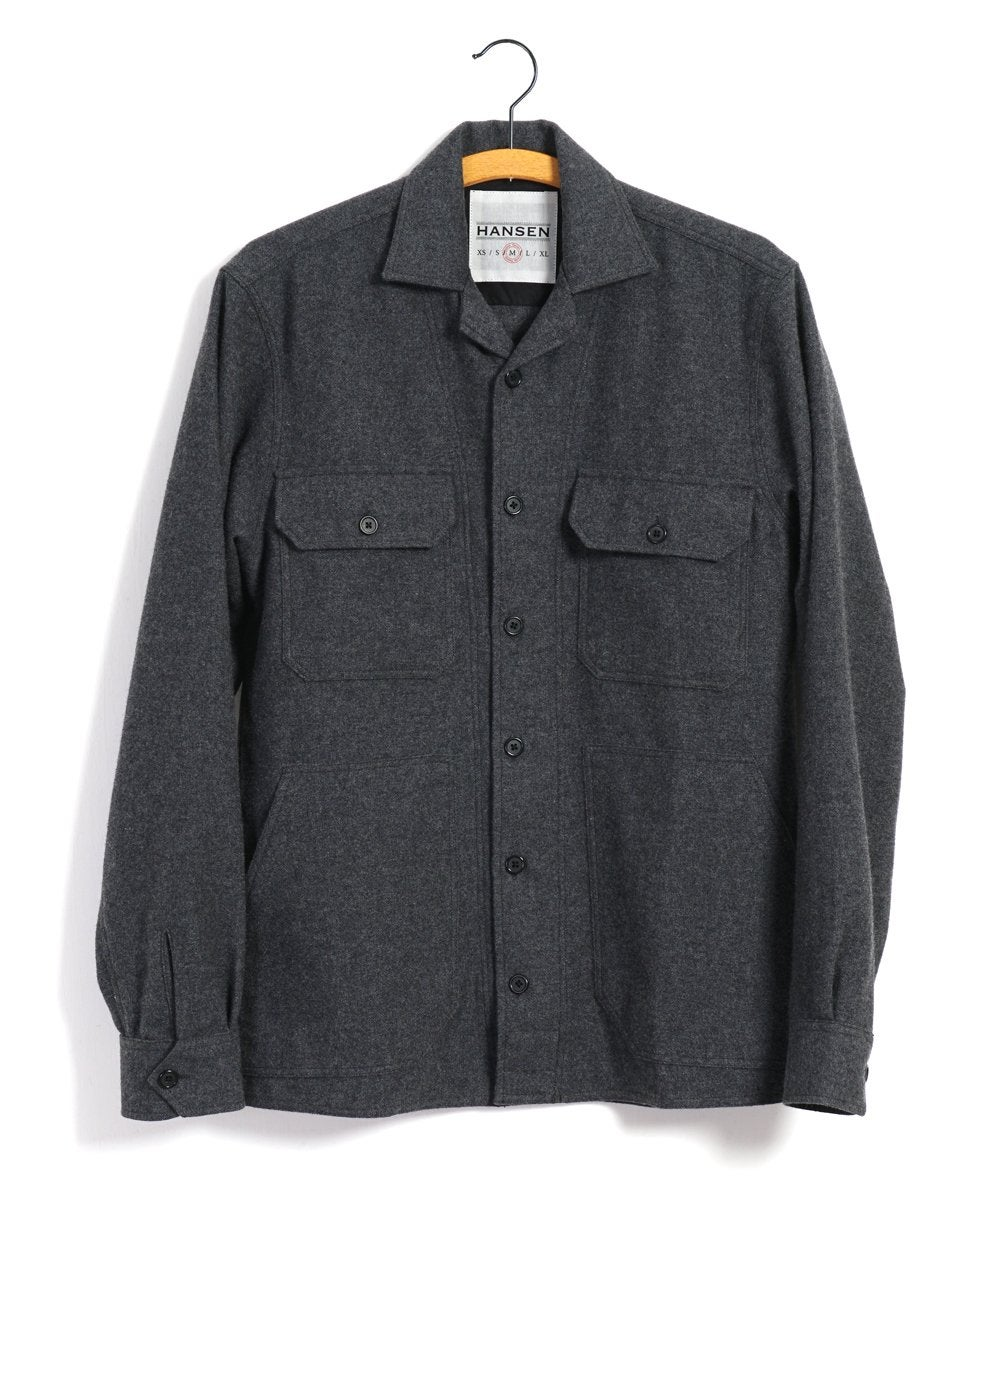 Hansen Garments STEFAN | Worker Over Shirt | grey melange